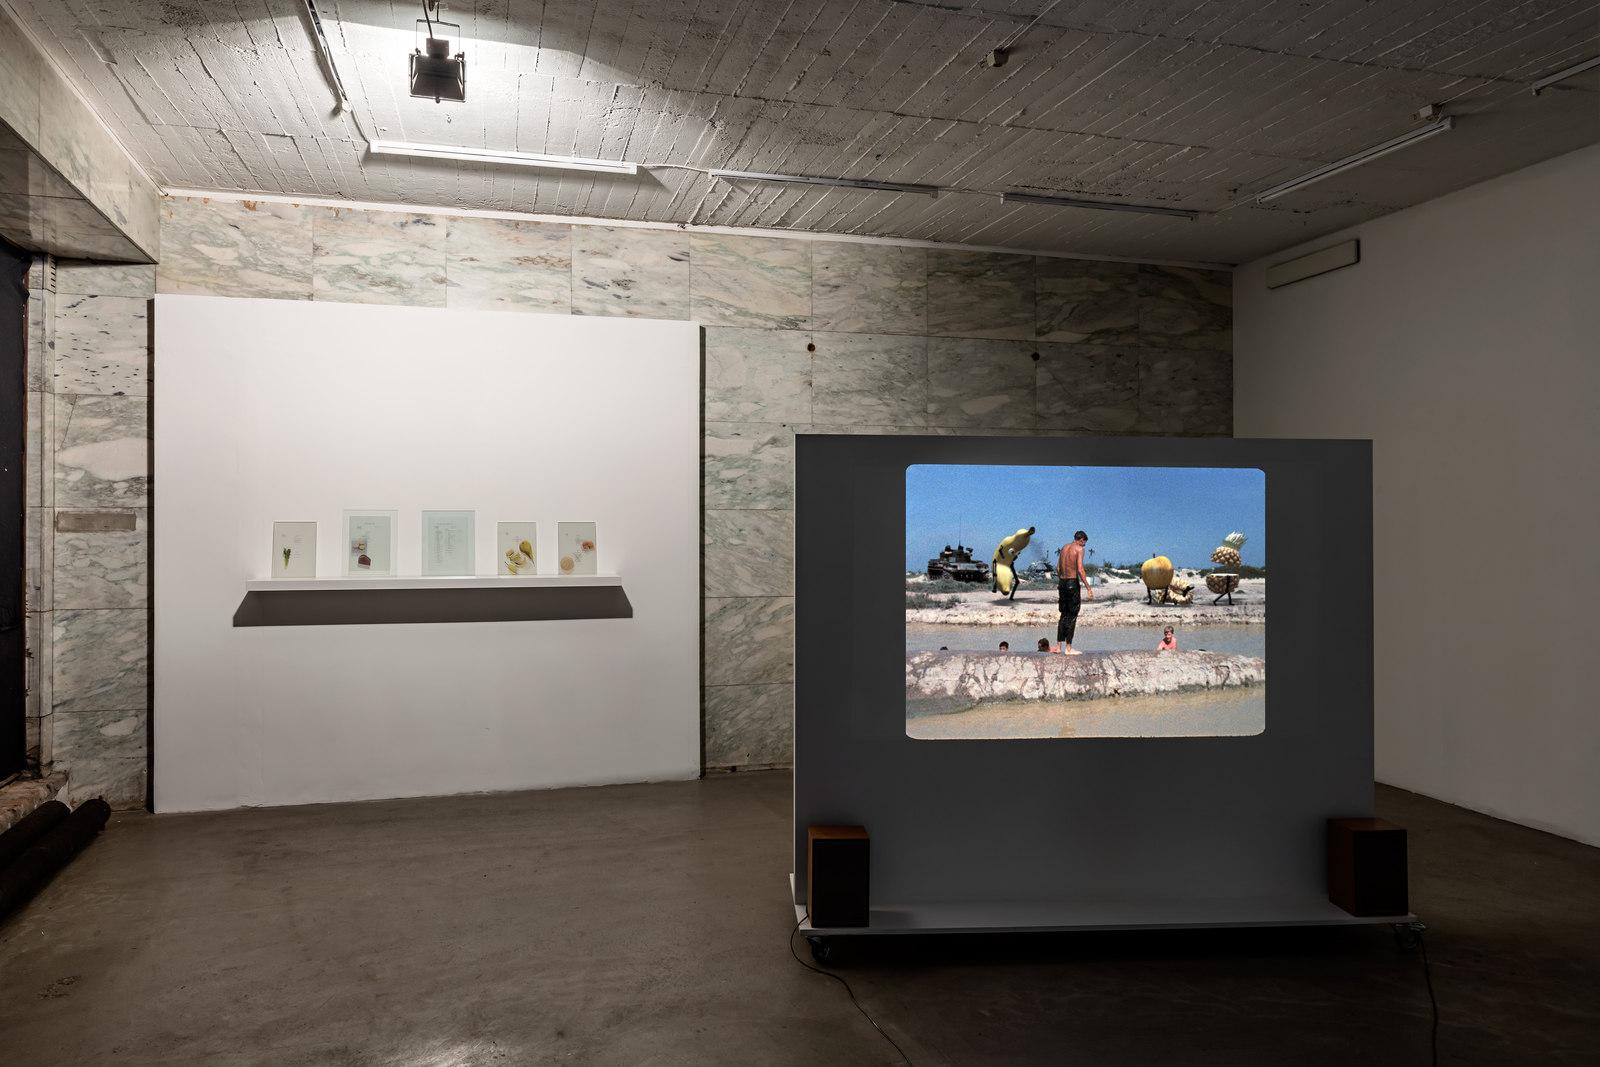 VI, VII-Benjamin Crotty at VI, VII, 2016-Exhibition view-Photograph by Vegard Kleven-Courtesy of VI, VII, Oslo